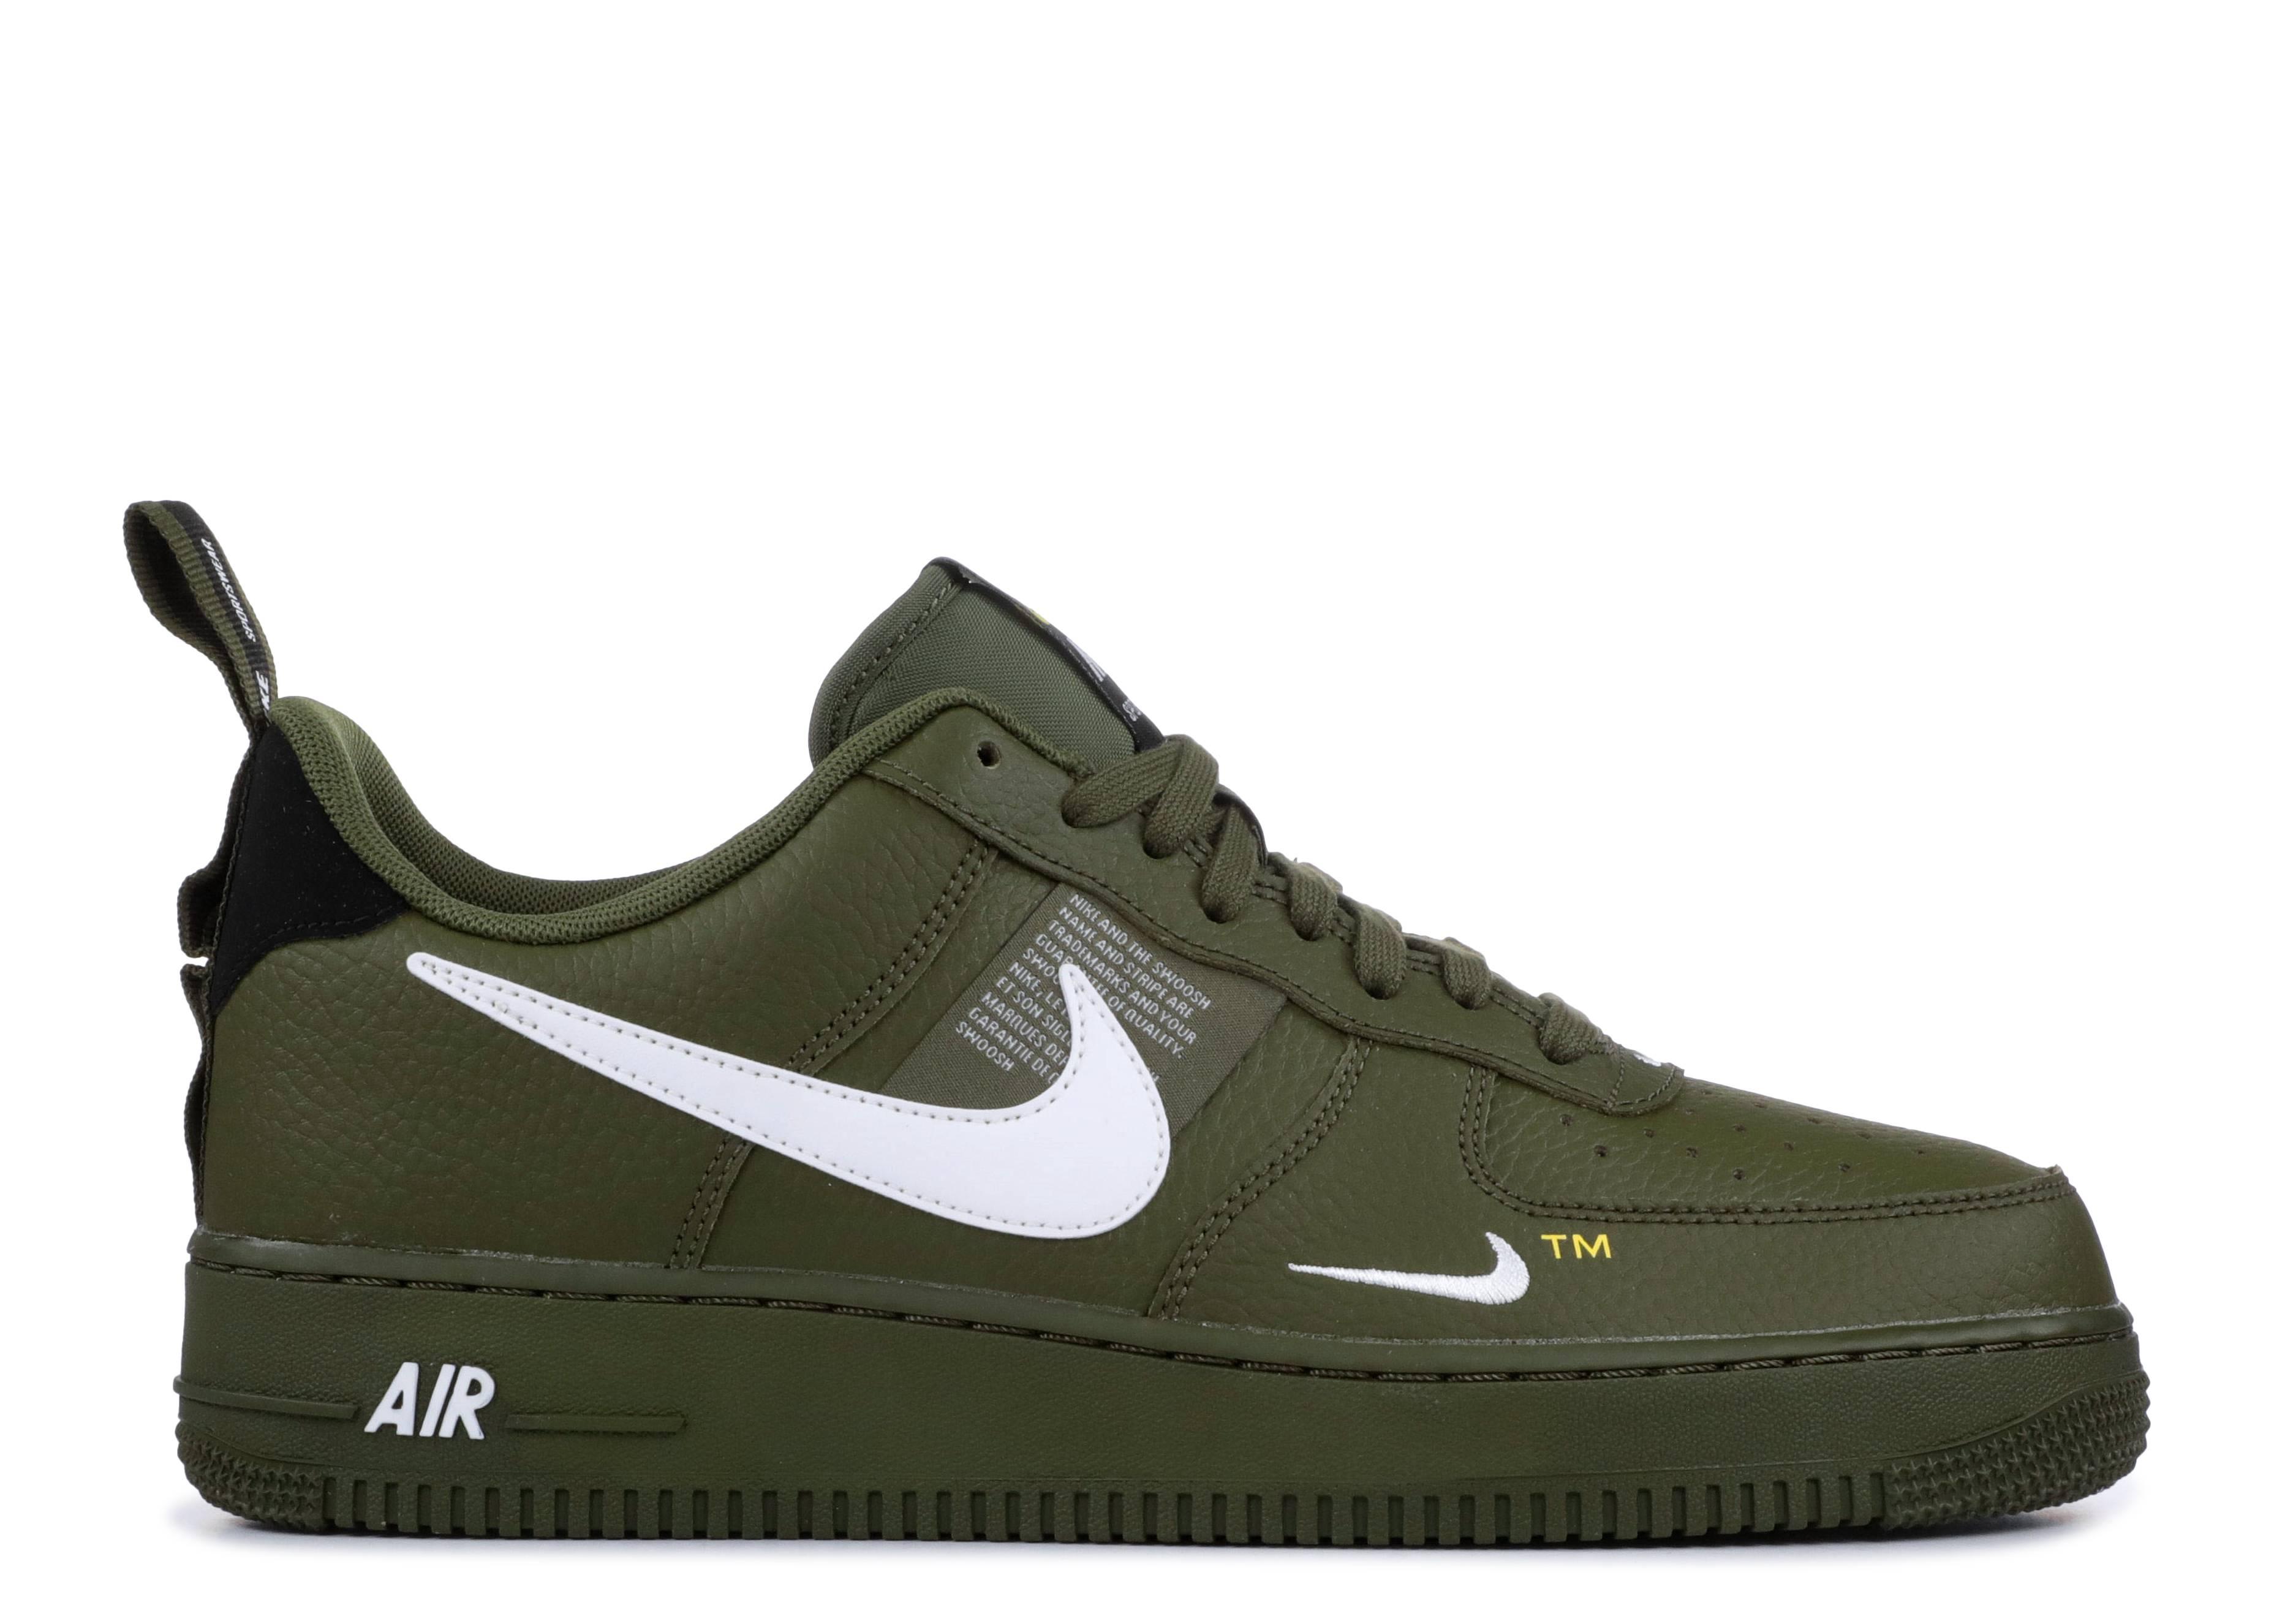 Air Force 1 '07 LV8 'Overbranding' - Nike - AJ7747 300 - olive ...